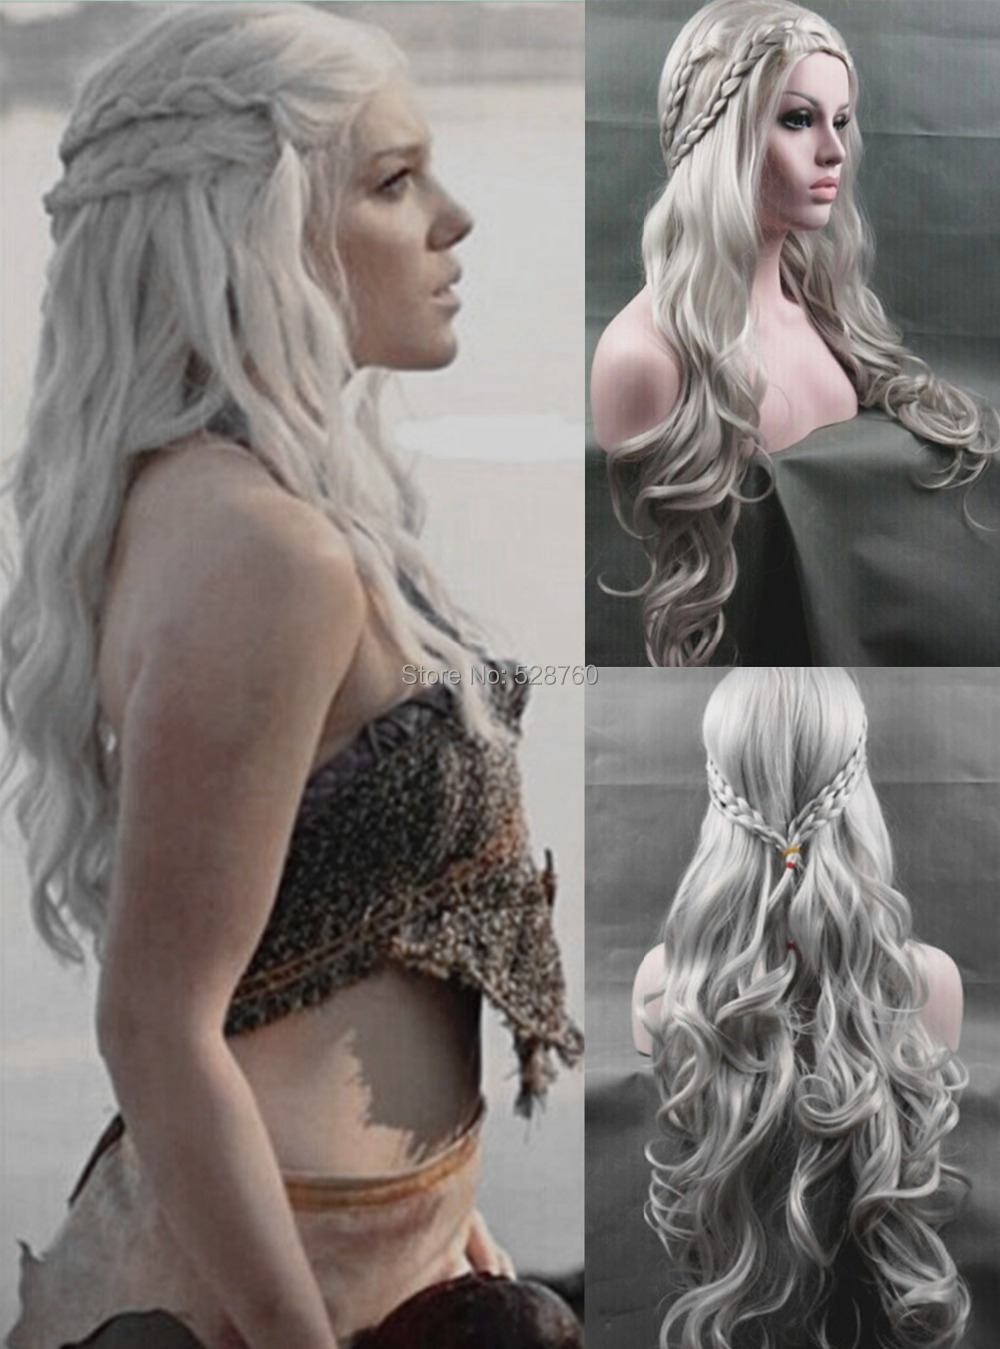 Cosplay Wig Inspired by Daenerys Targaryen Dragon Princess Game of Thrones Braids Costume Wigs